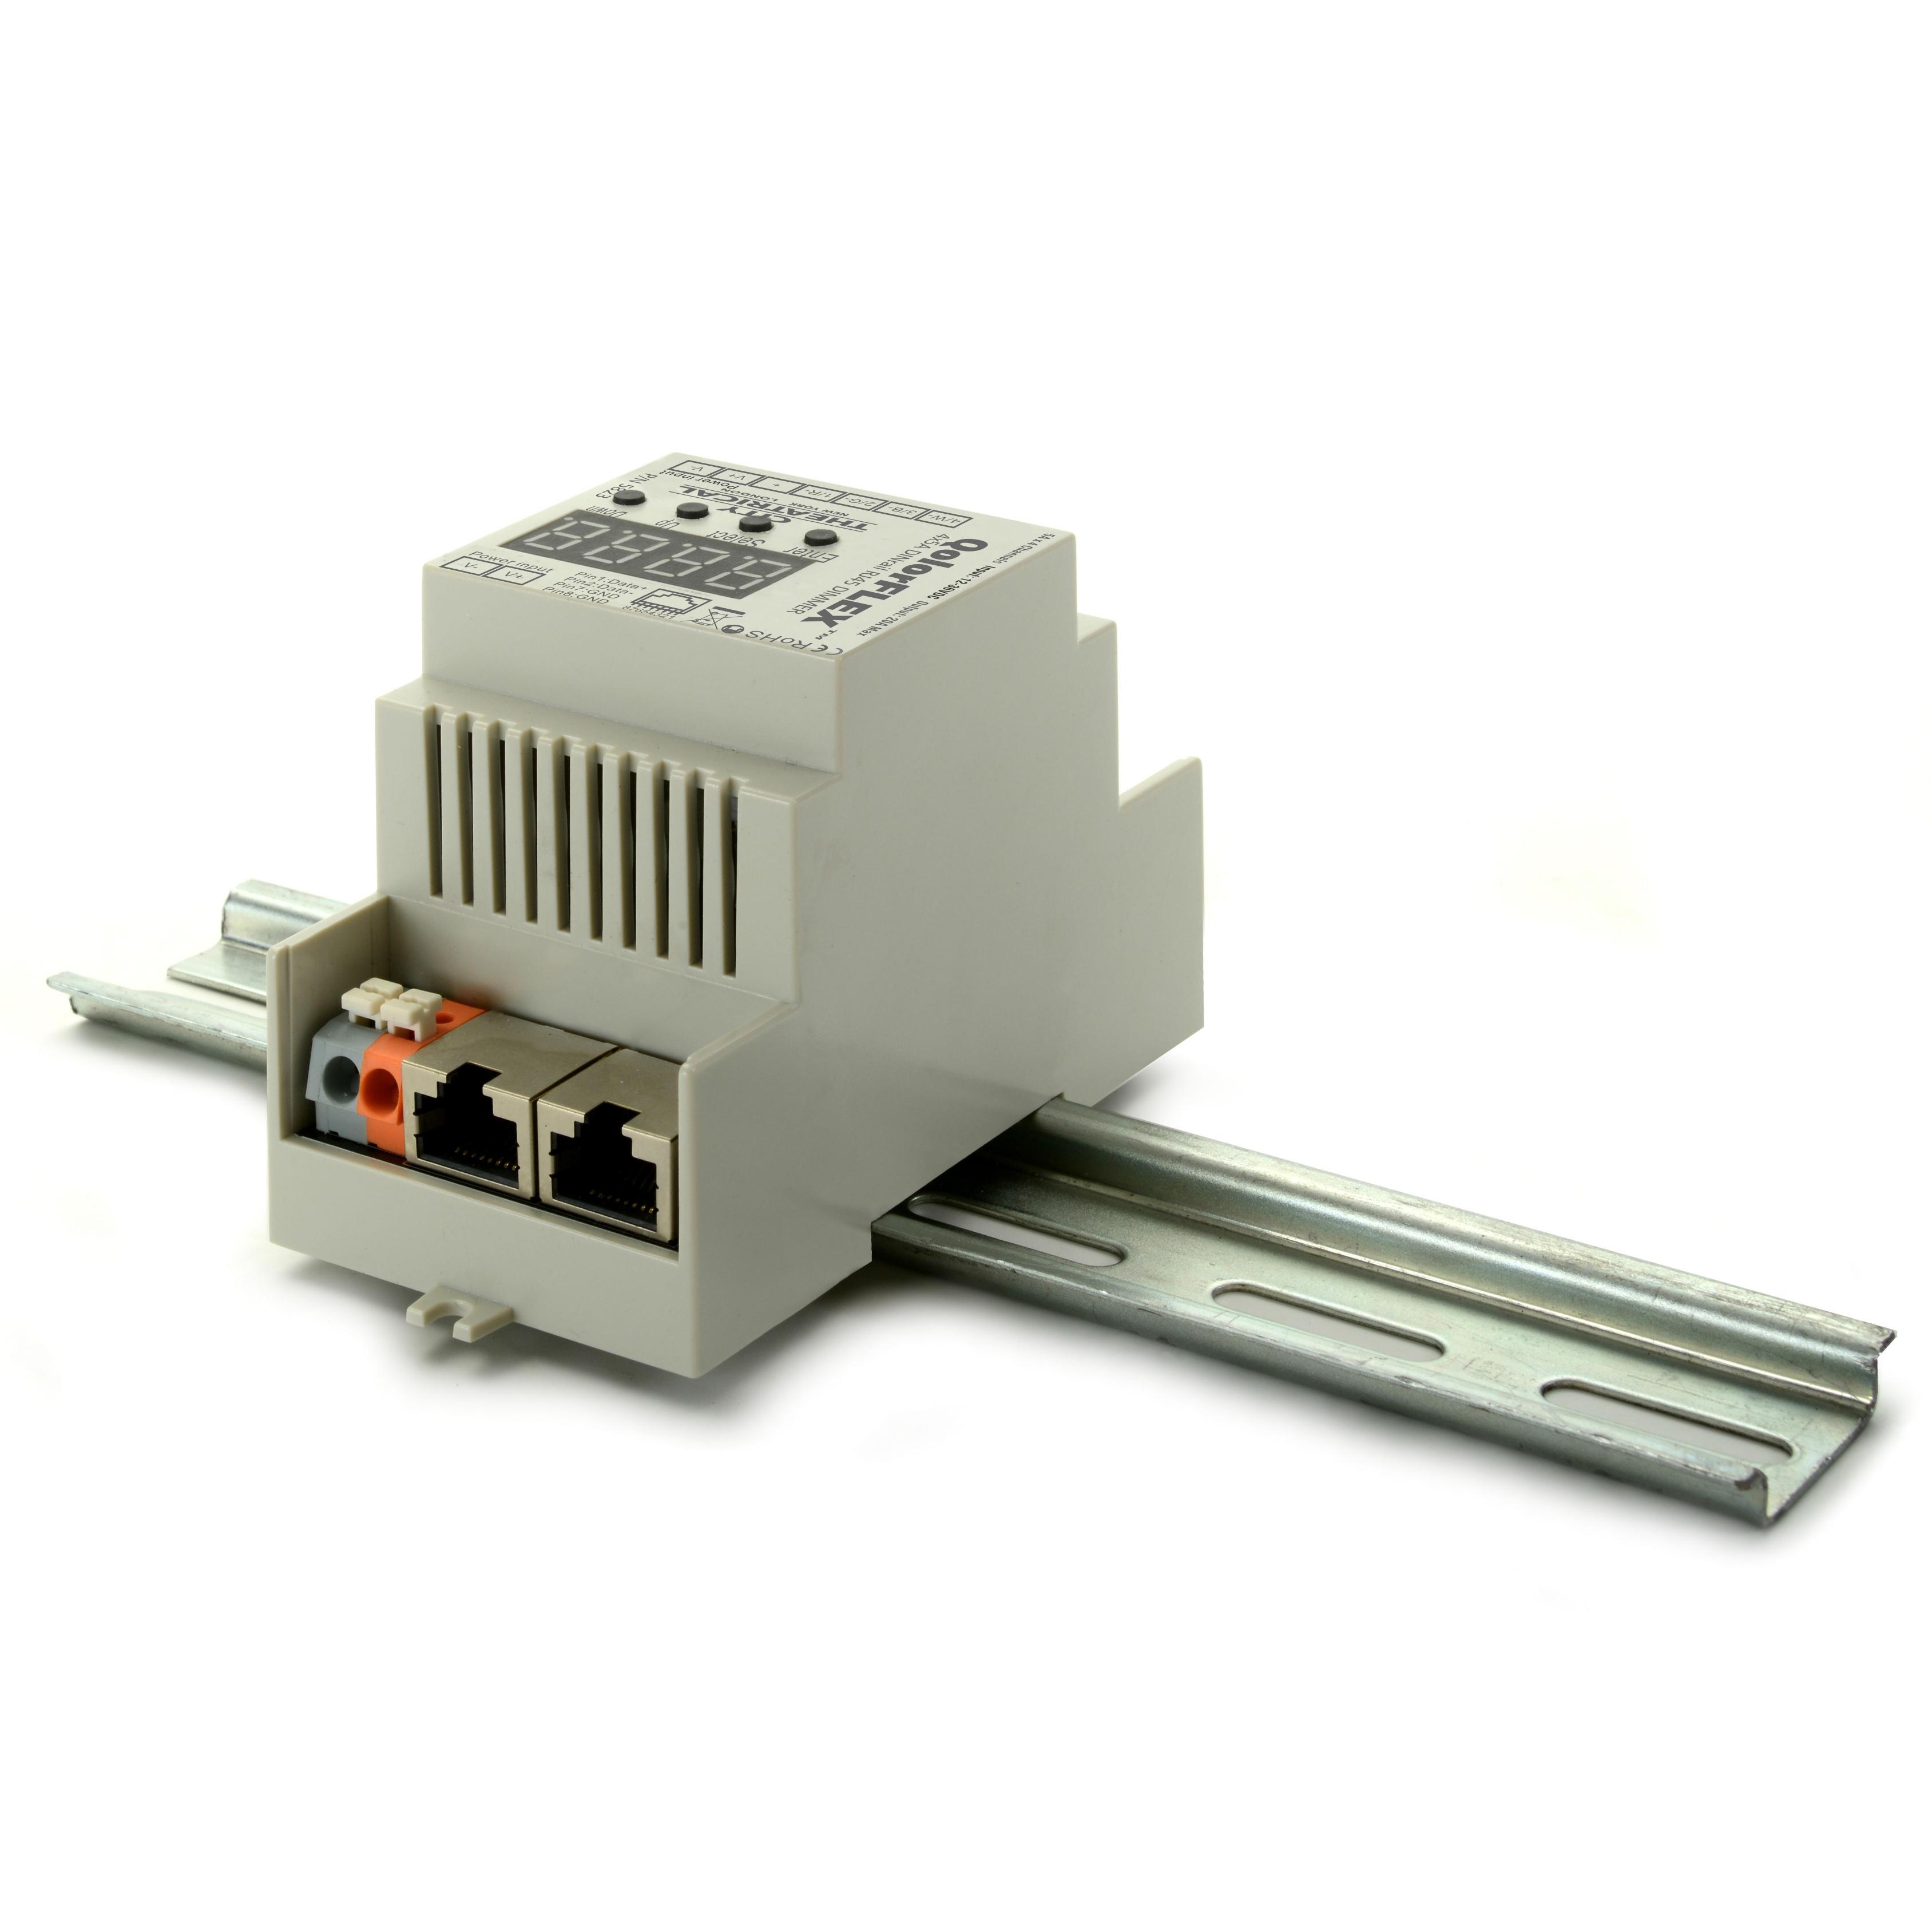 Qolorflex 4x5a Dinrail Rj45 Dimmer 4 Way Switch Box